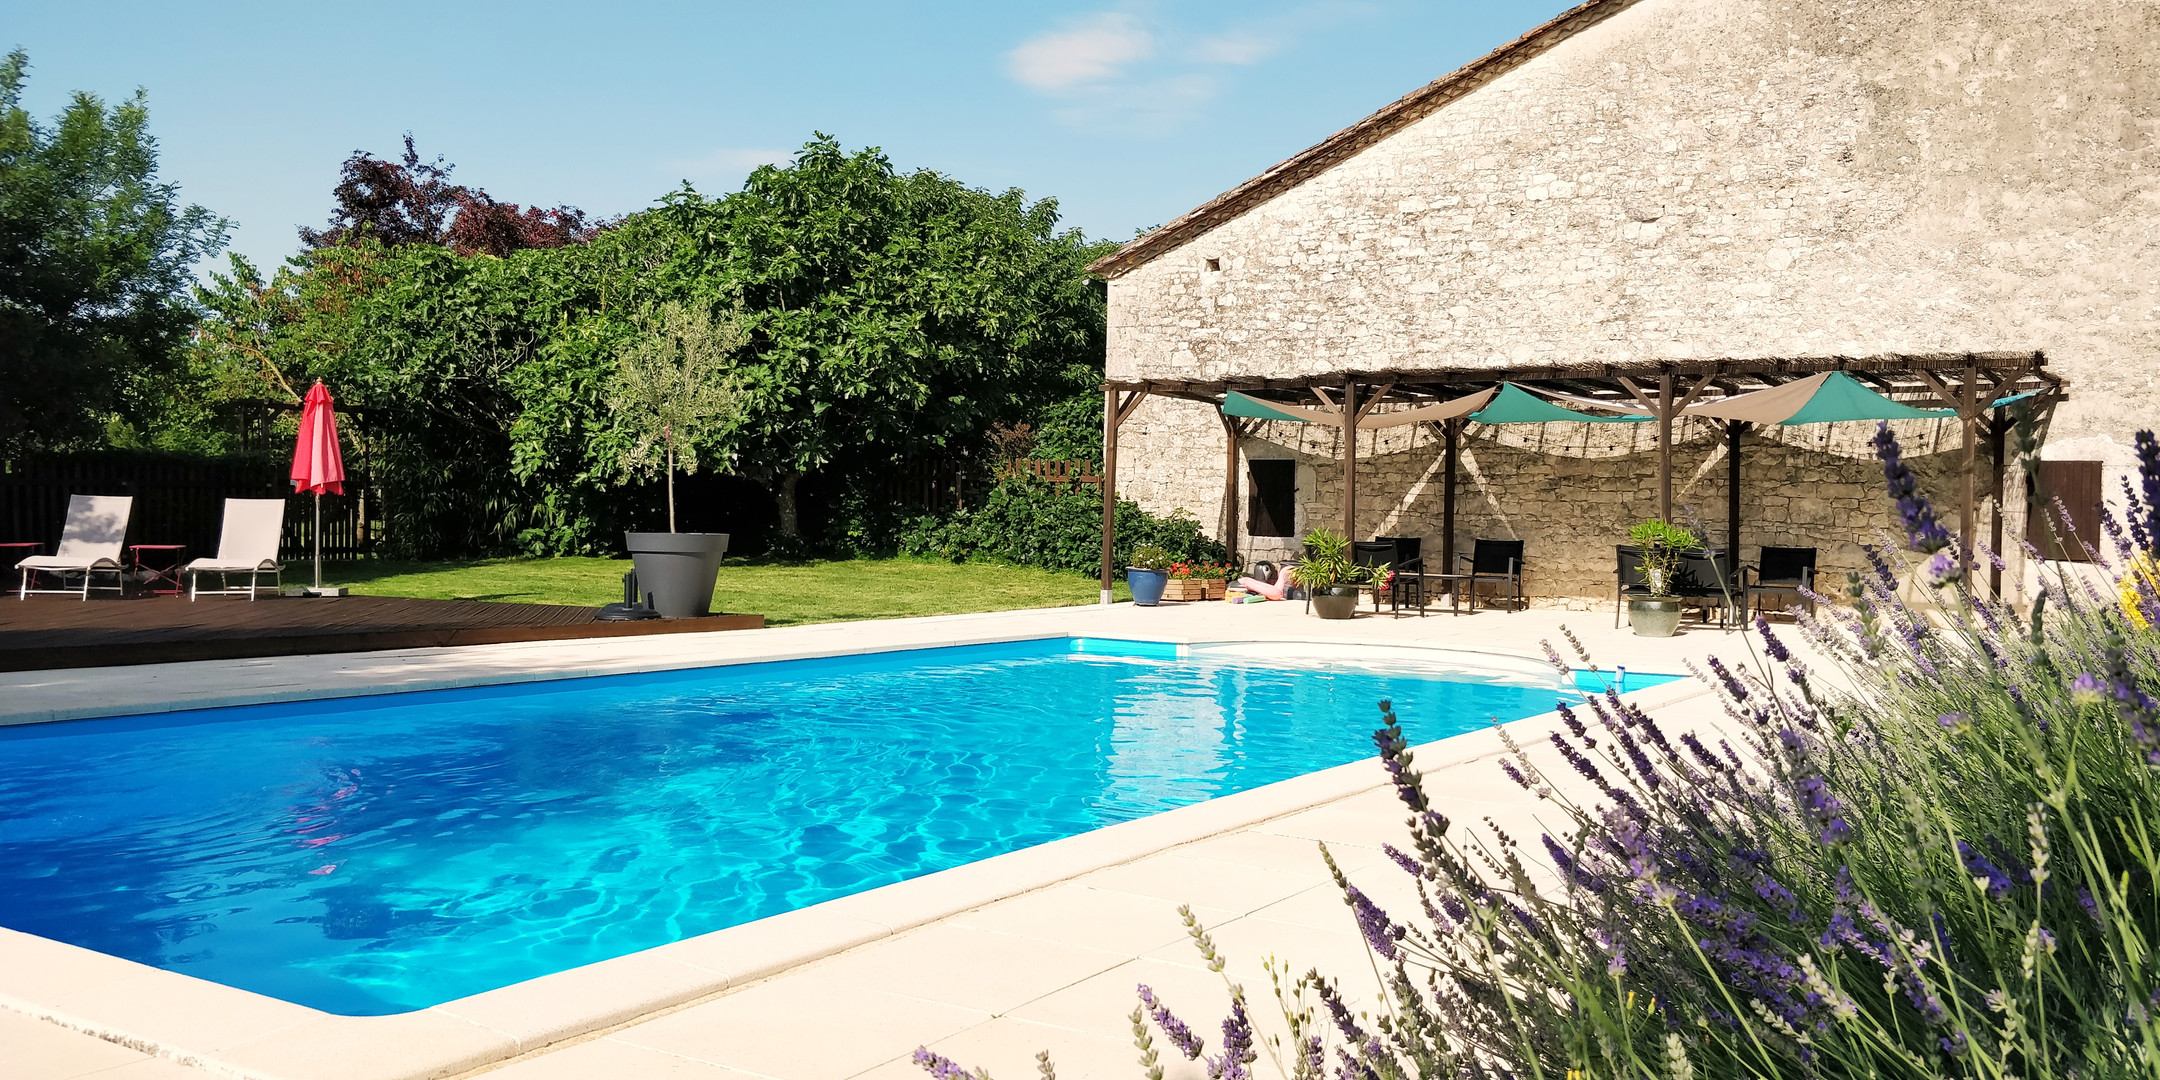 Cottages de Garrigue swimming pool